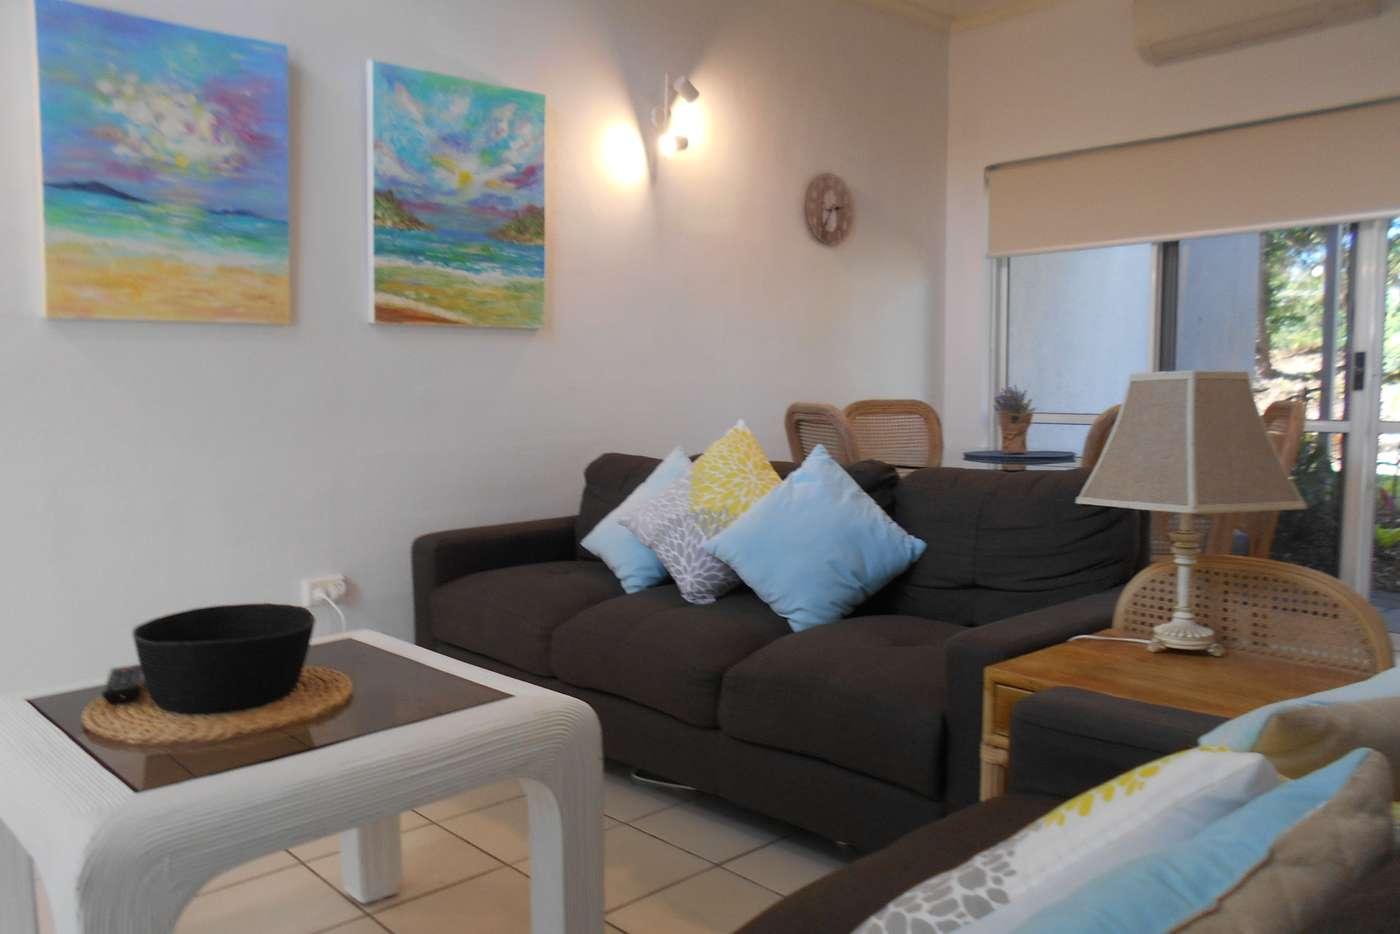 Main view of Homely apartment listing, Villa 143 Reef Resort 121 Port Douglas Rd, Port Douglas QLD 4877